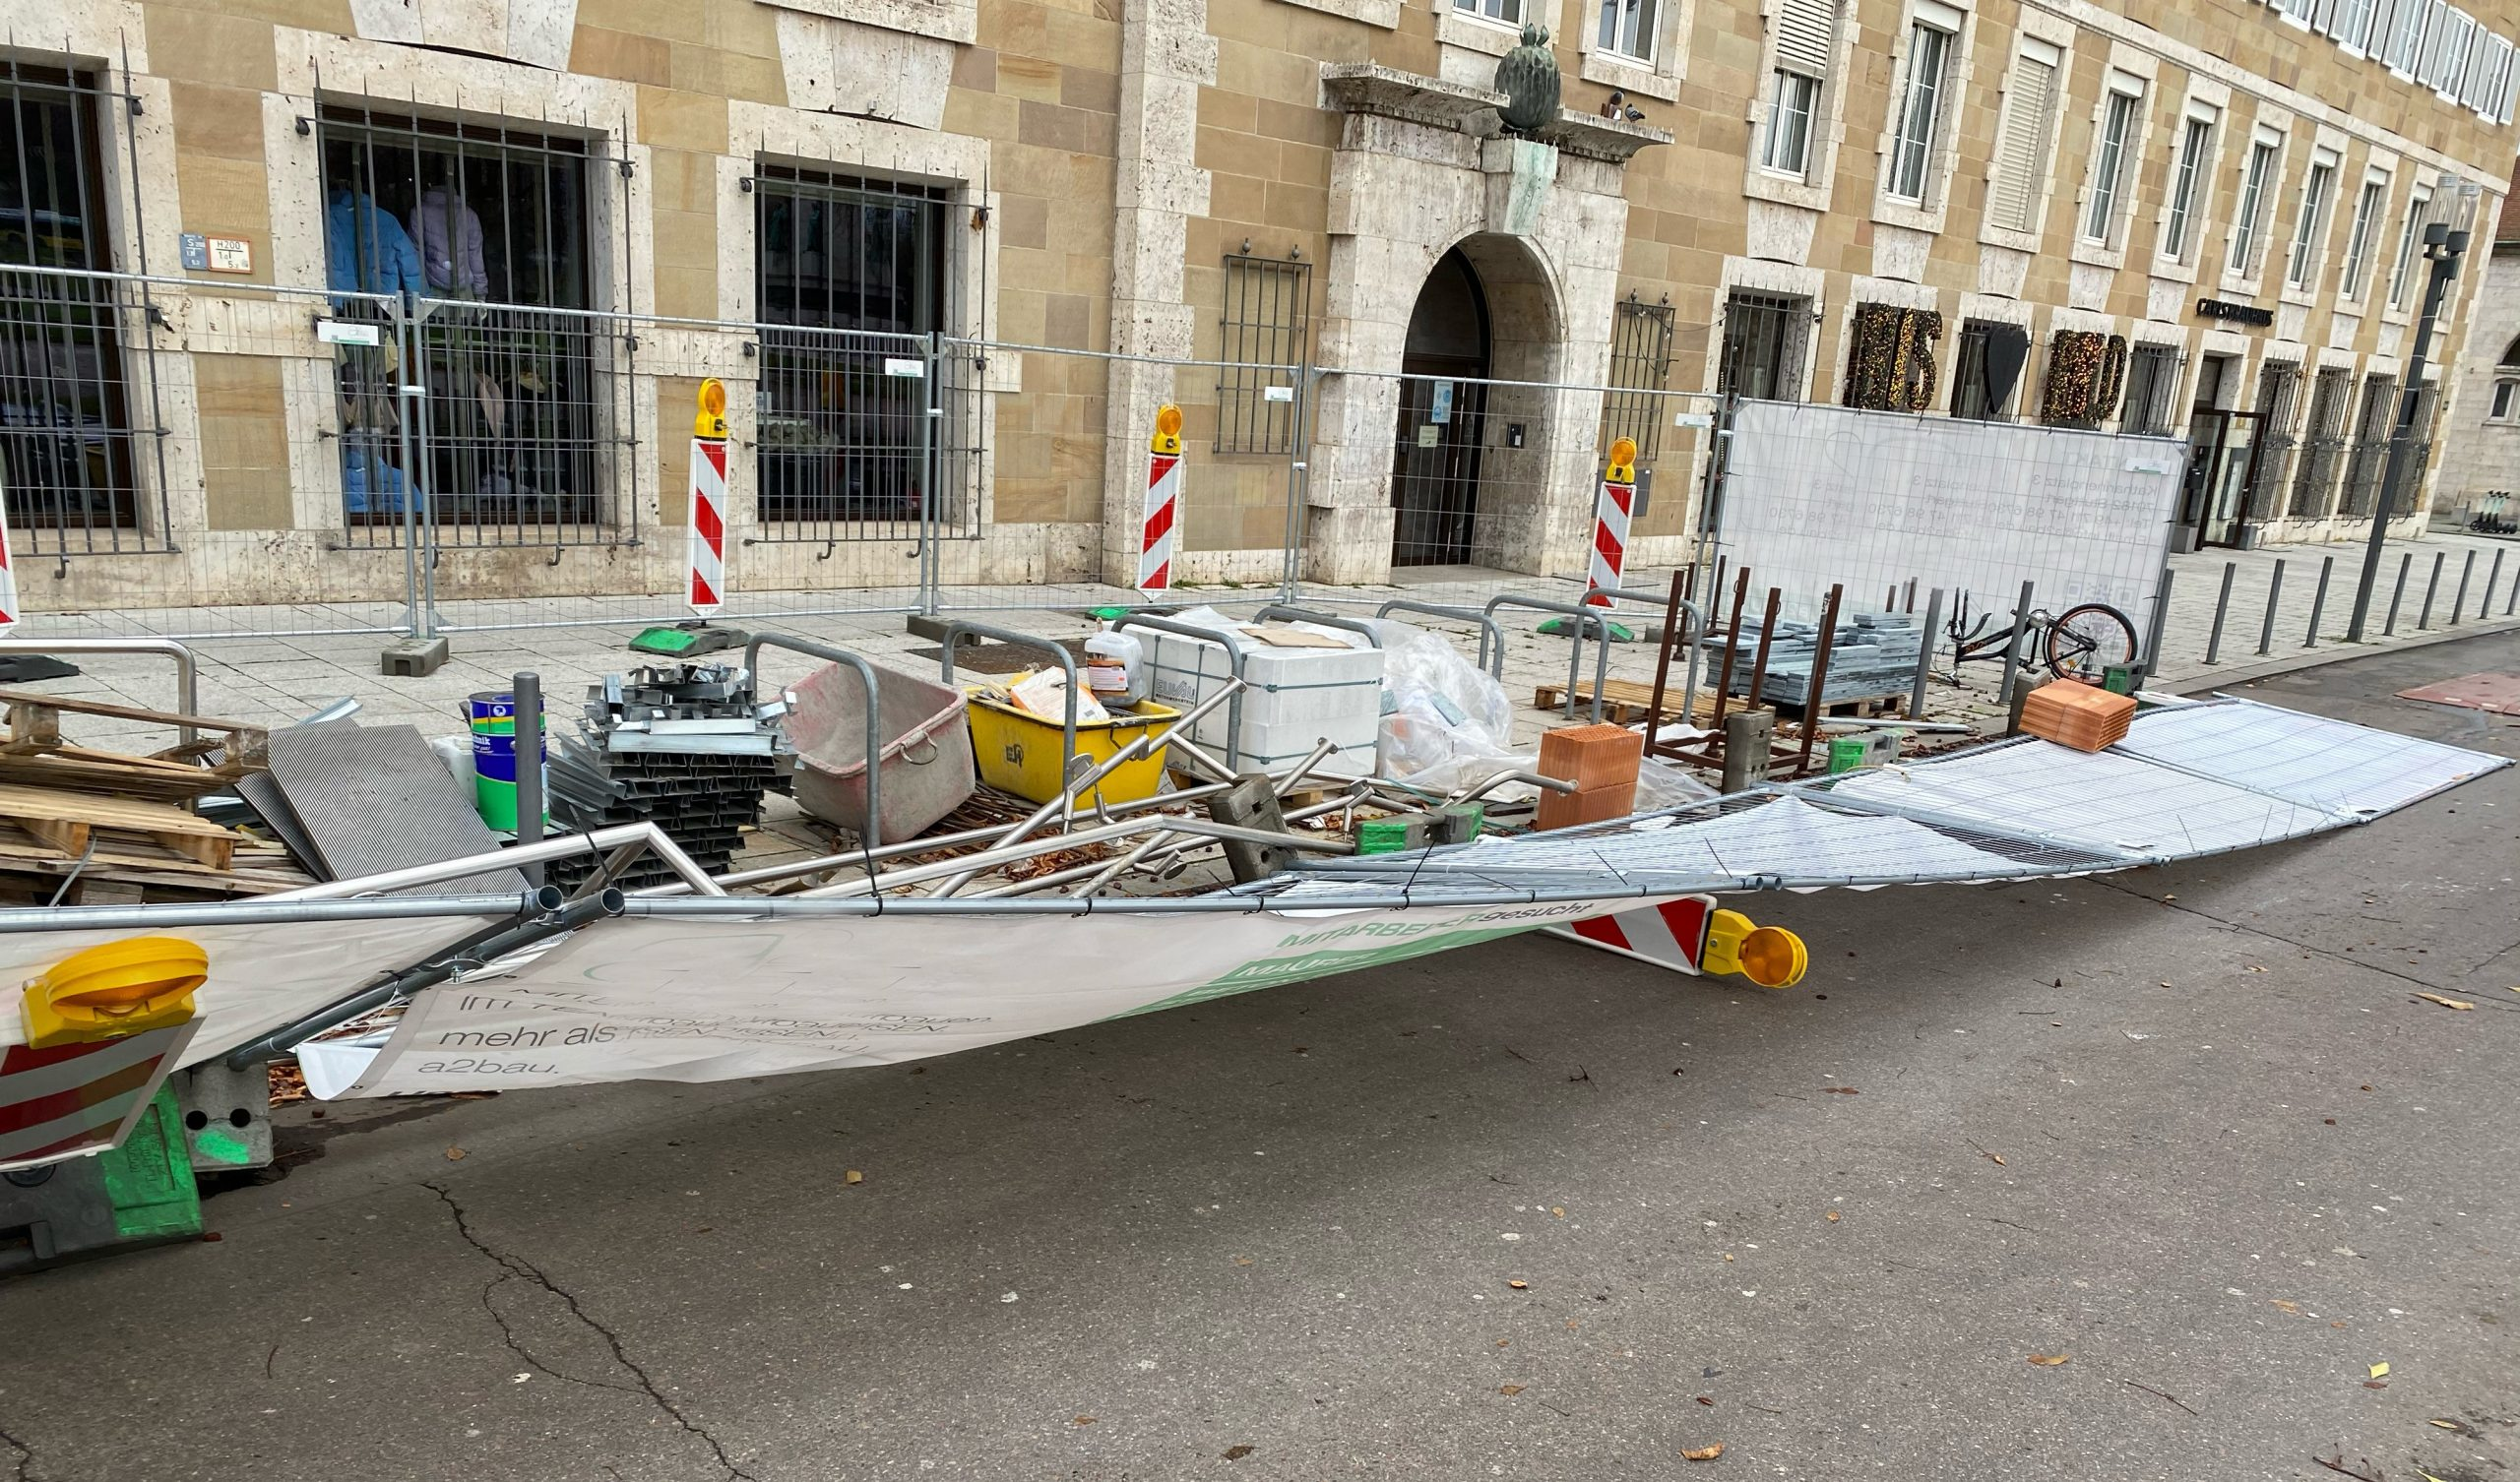 Baustelle - Überwachung / Baustellenüberwachung Stuttgart